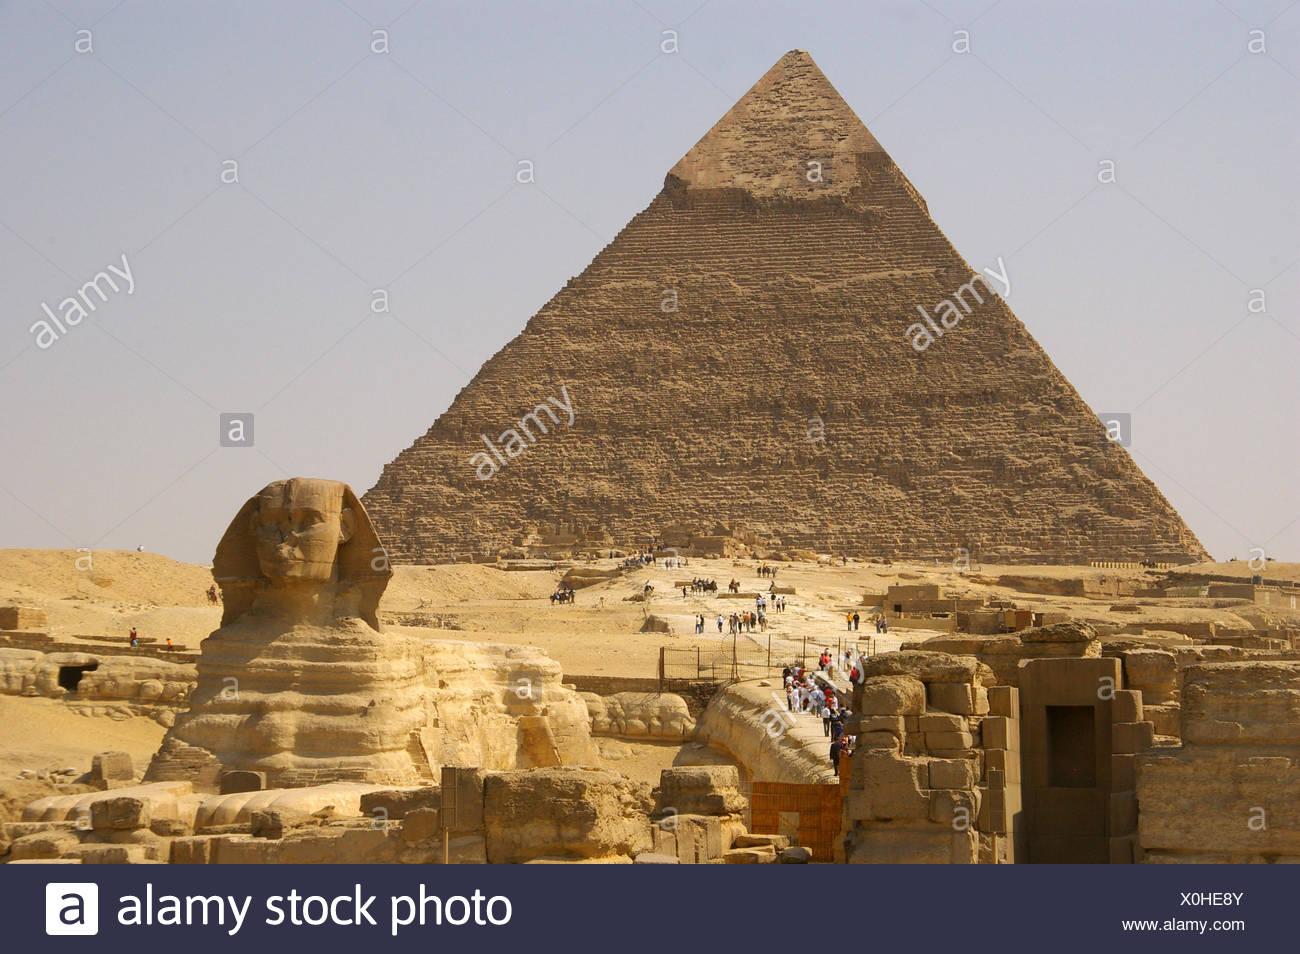 hot pyramid egypt sphinx firmament sky sands sand shine shines